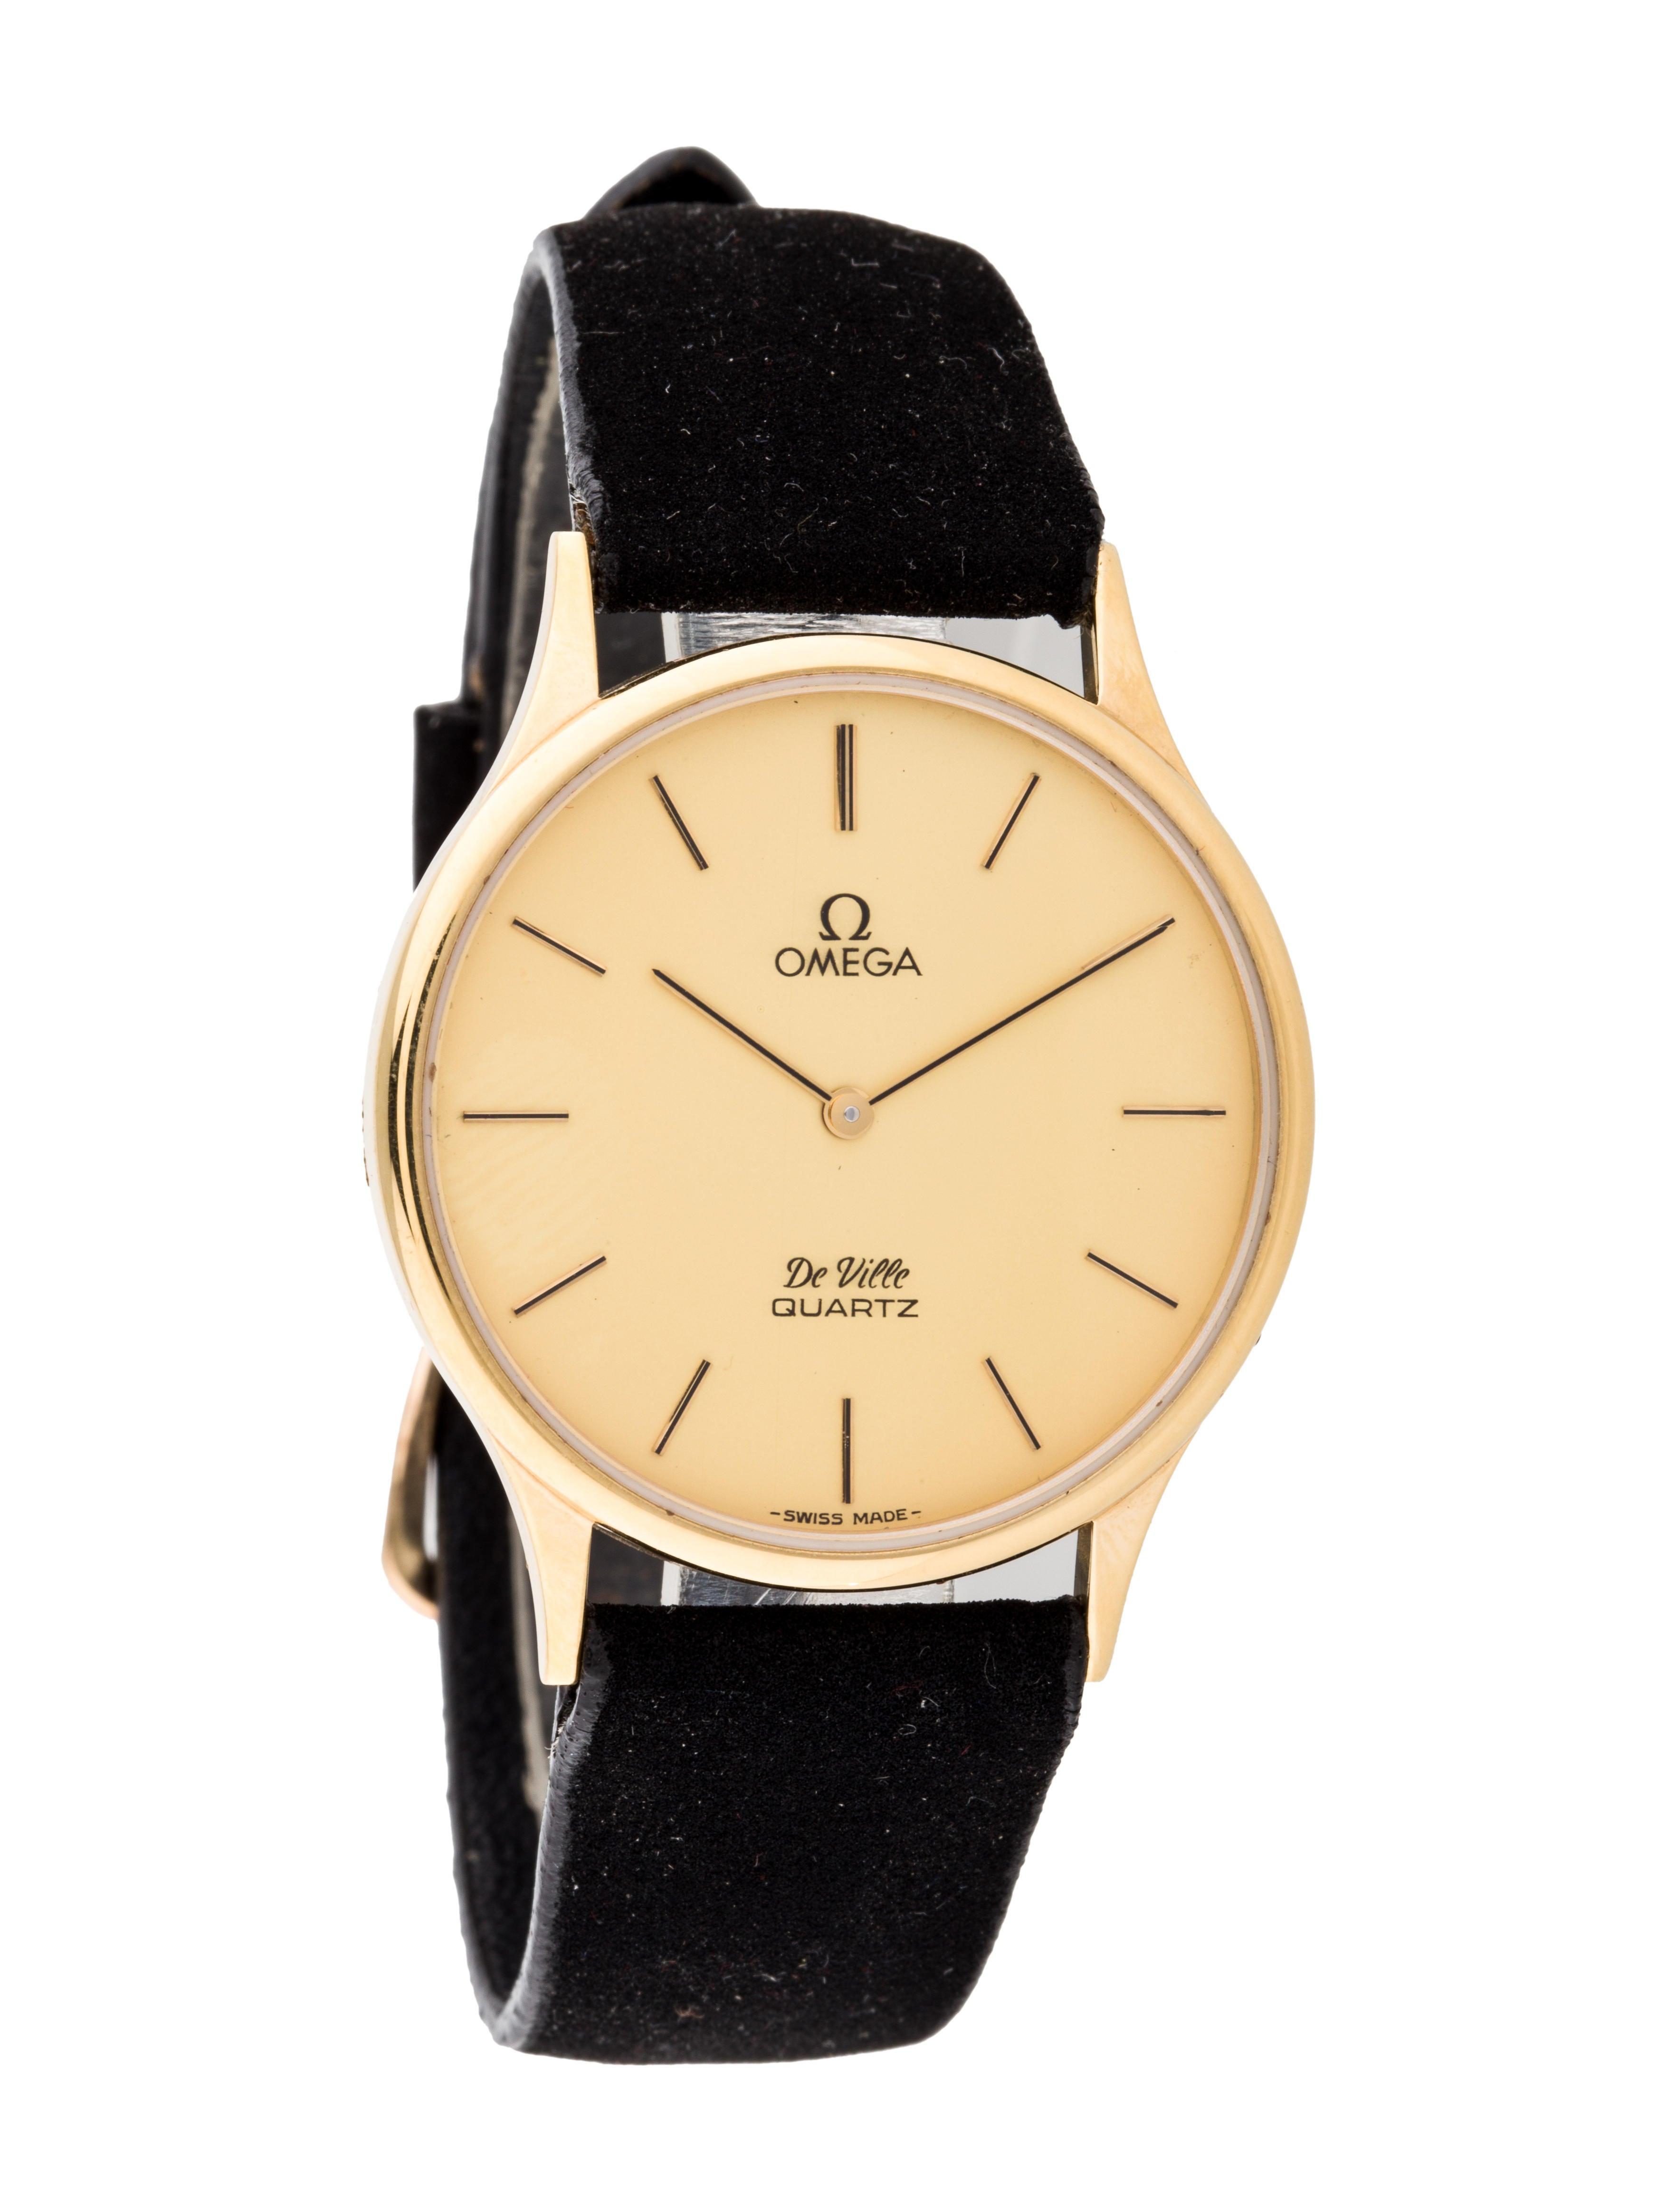 Omega De Ville Quartz Watch Strap Omg20168 The Realreal